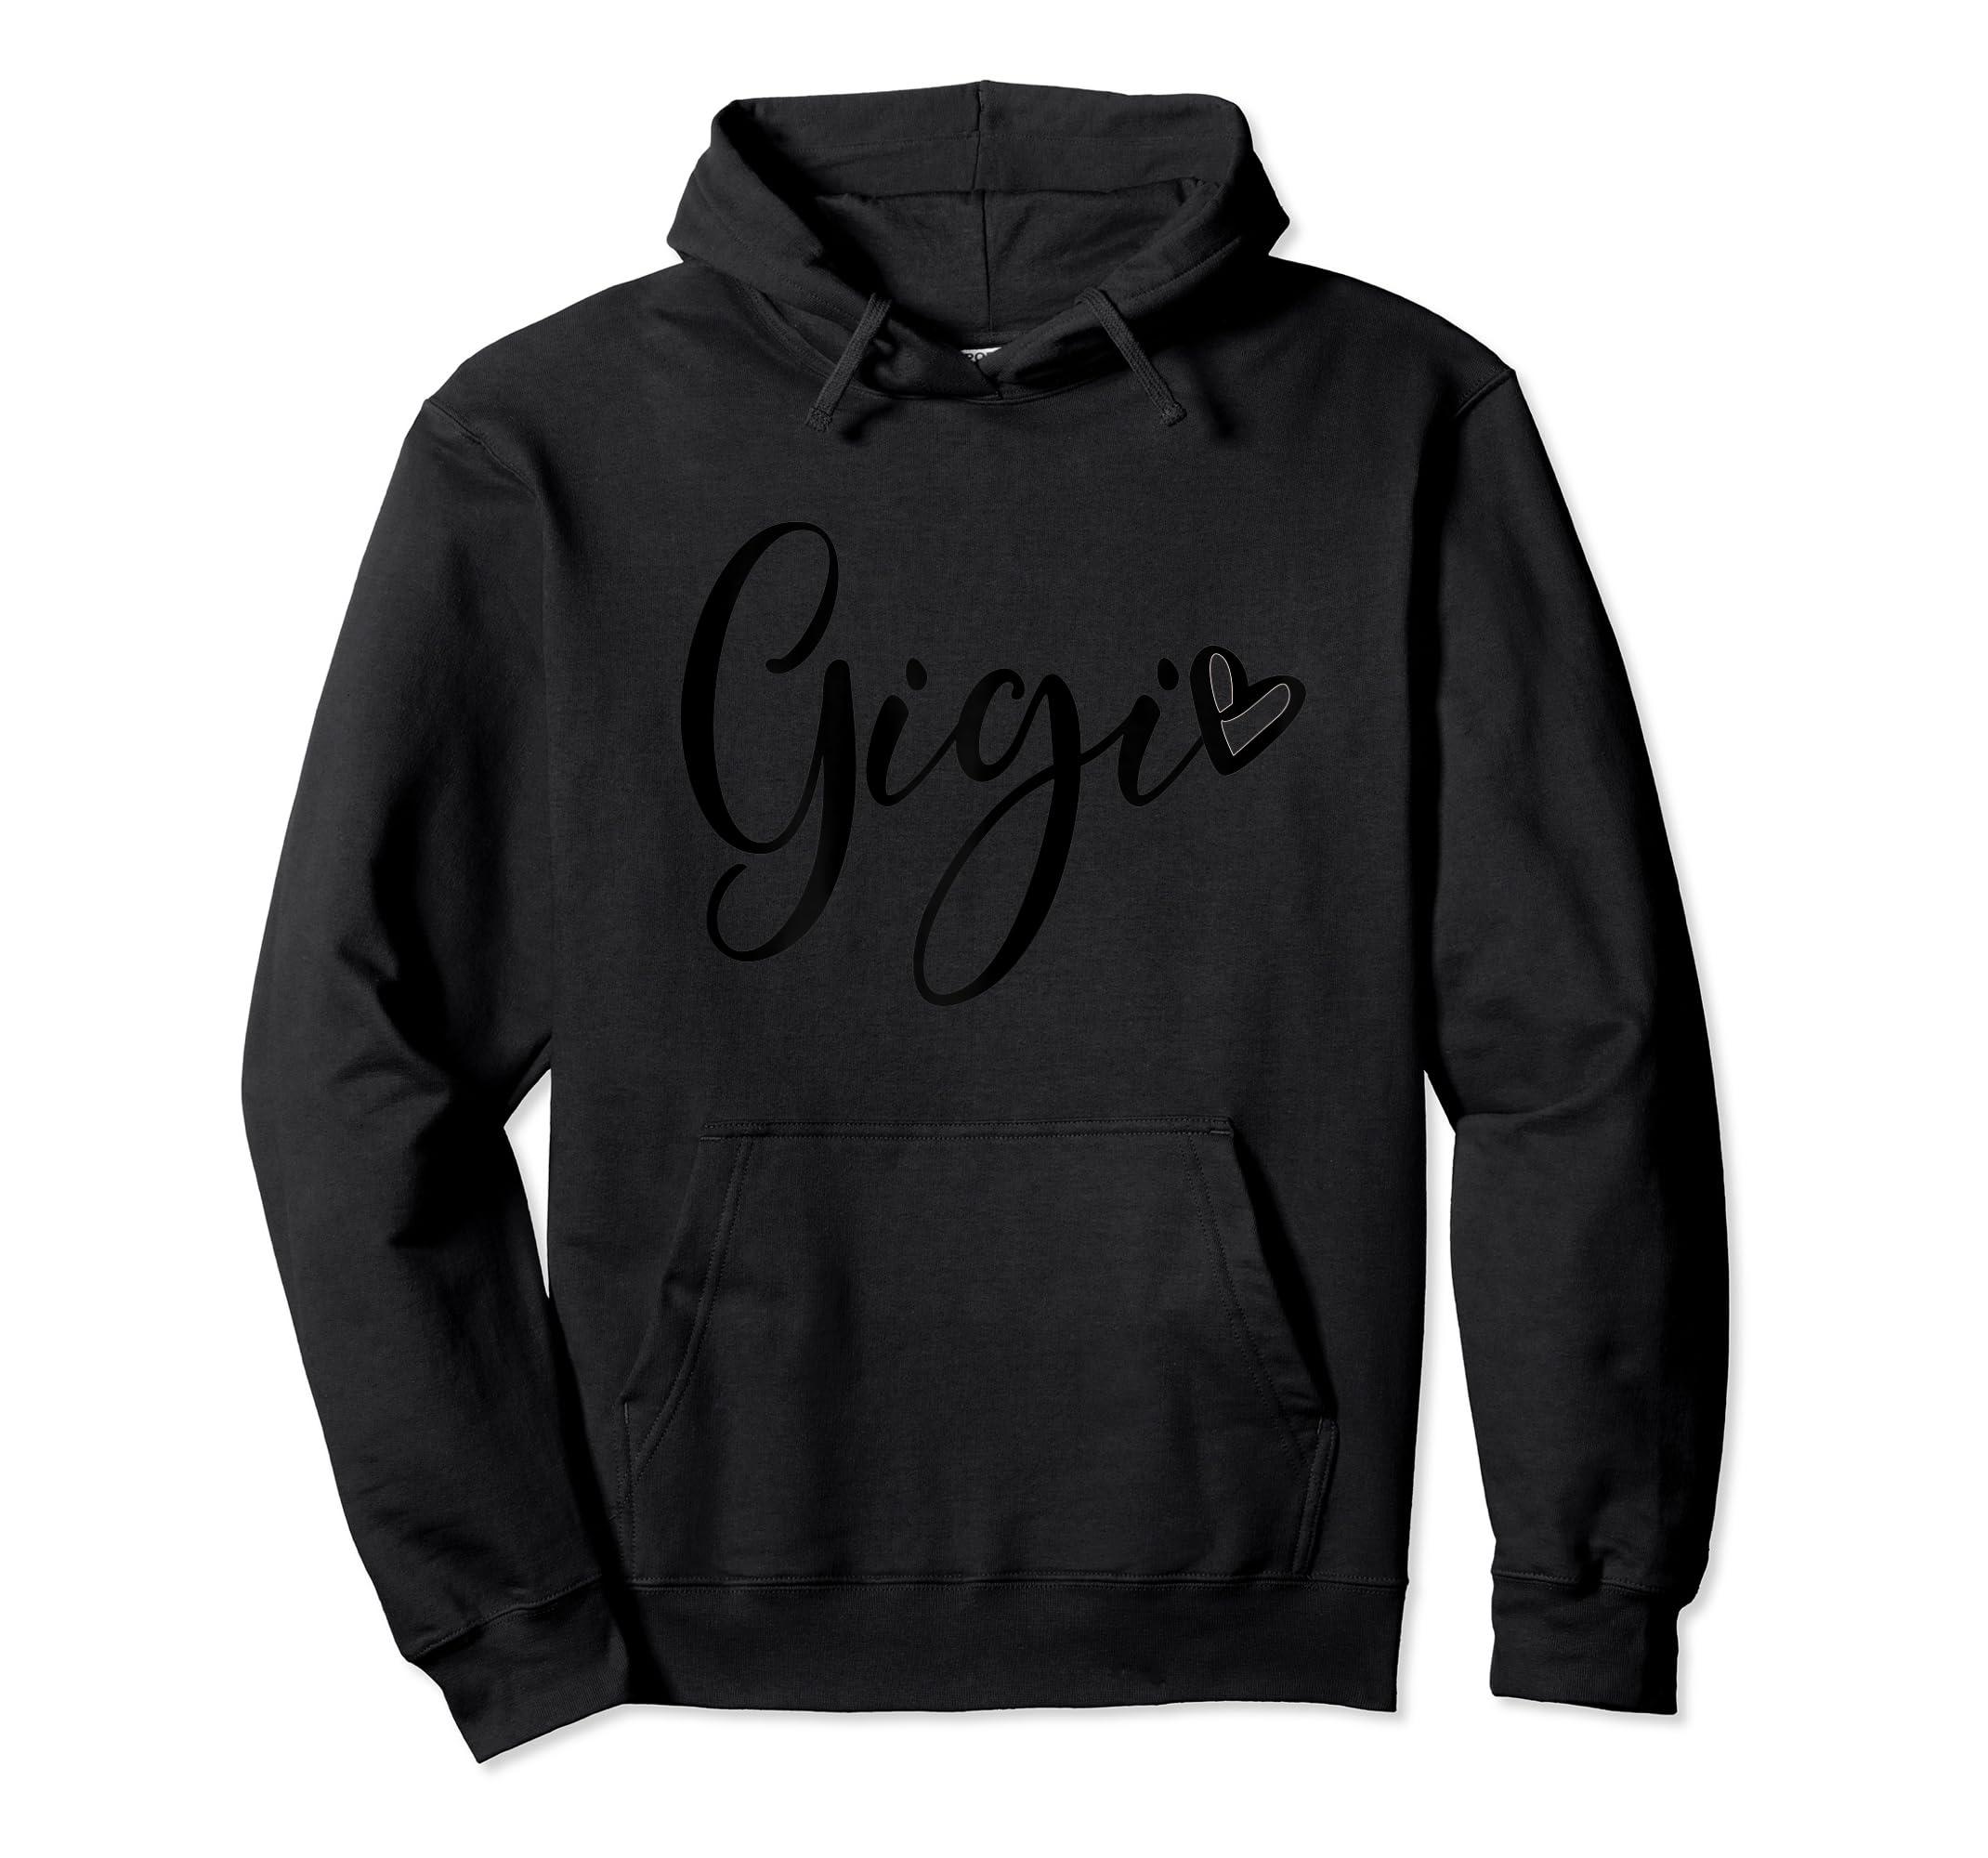 Womens Gigi Grandma T Shirt Pregnancy Announcement Mother's Day-Hoodie-Black